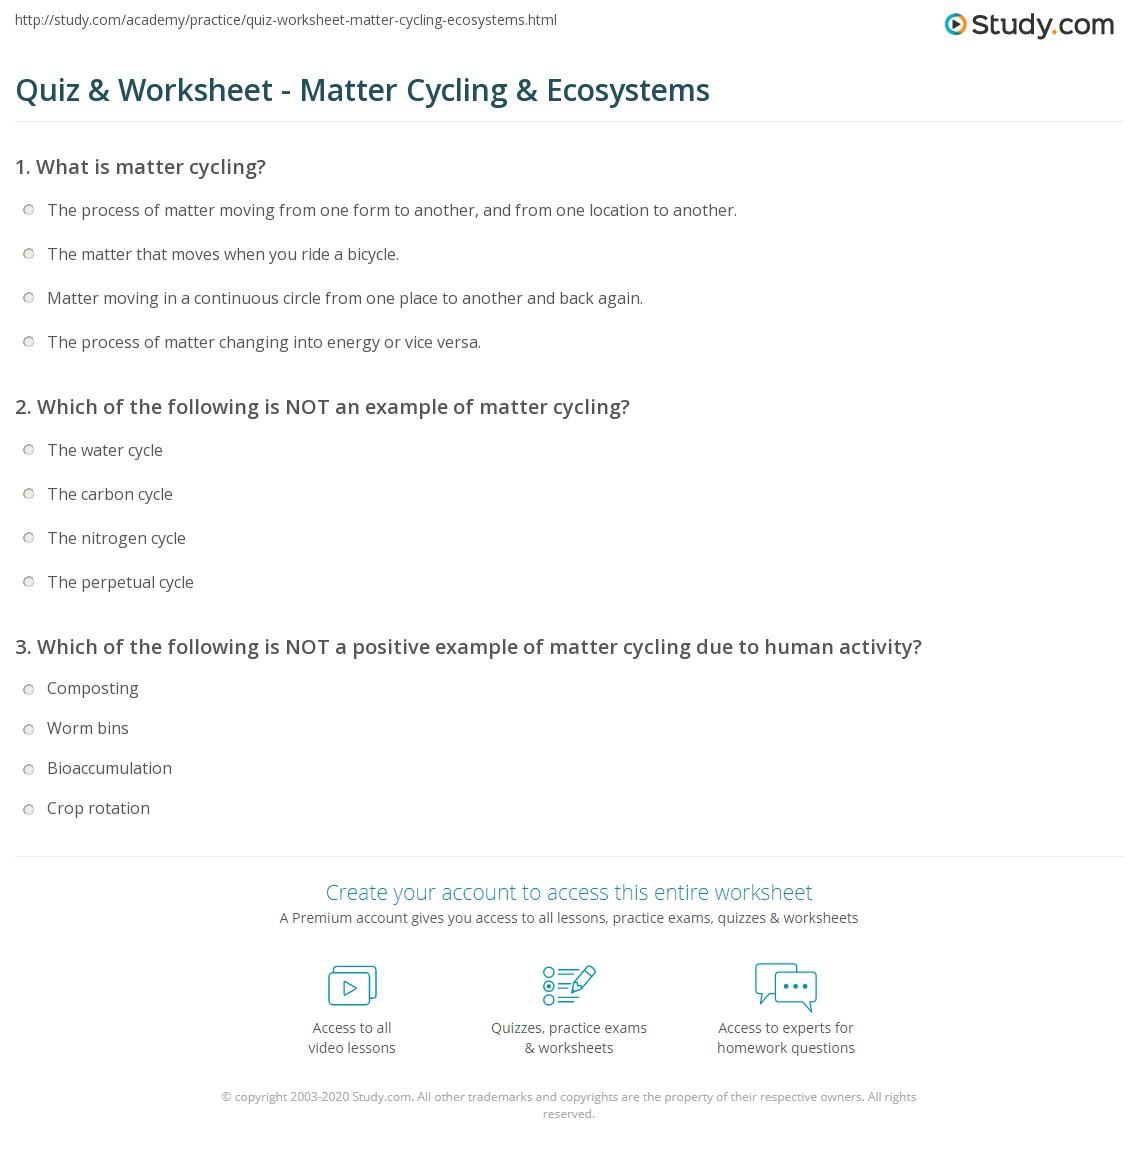 Quiz & Worksheet - Matter Cycling & Ecosystems | Study.com